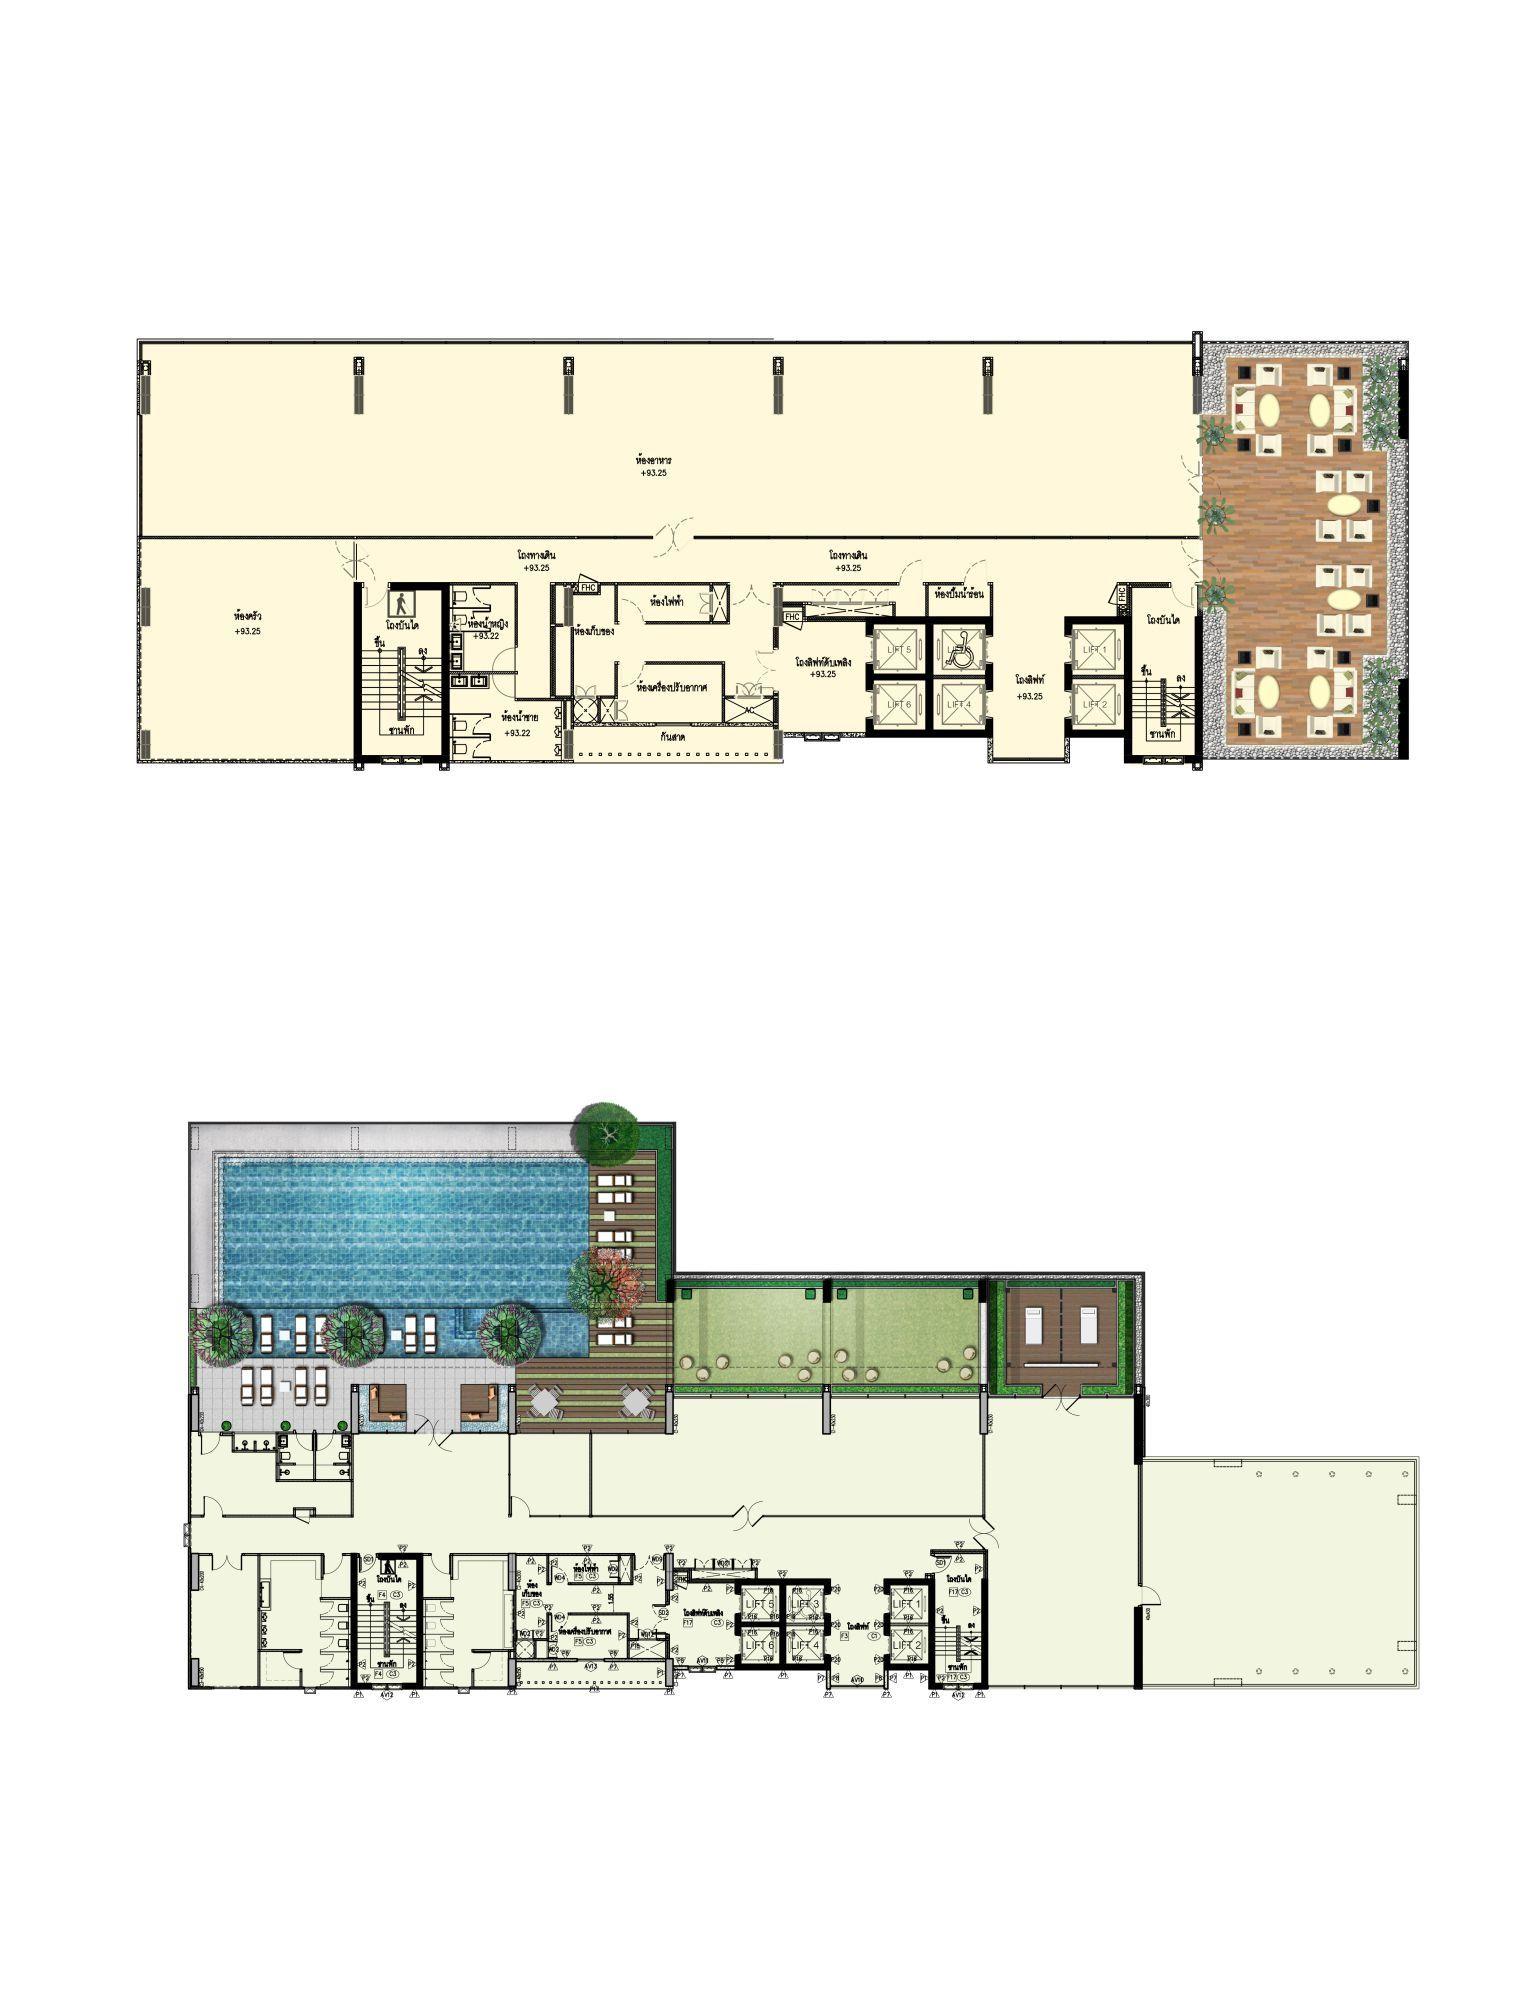 Novotel Sriracha Hotel Plan Roof Garden Plan Hotel Floor